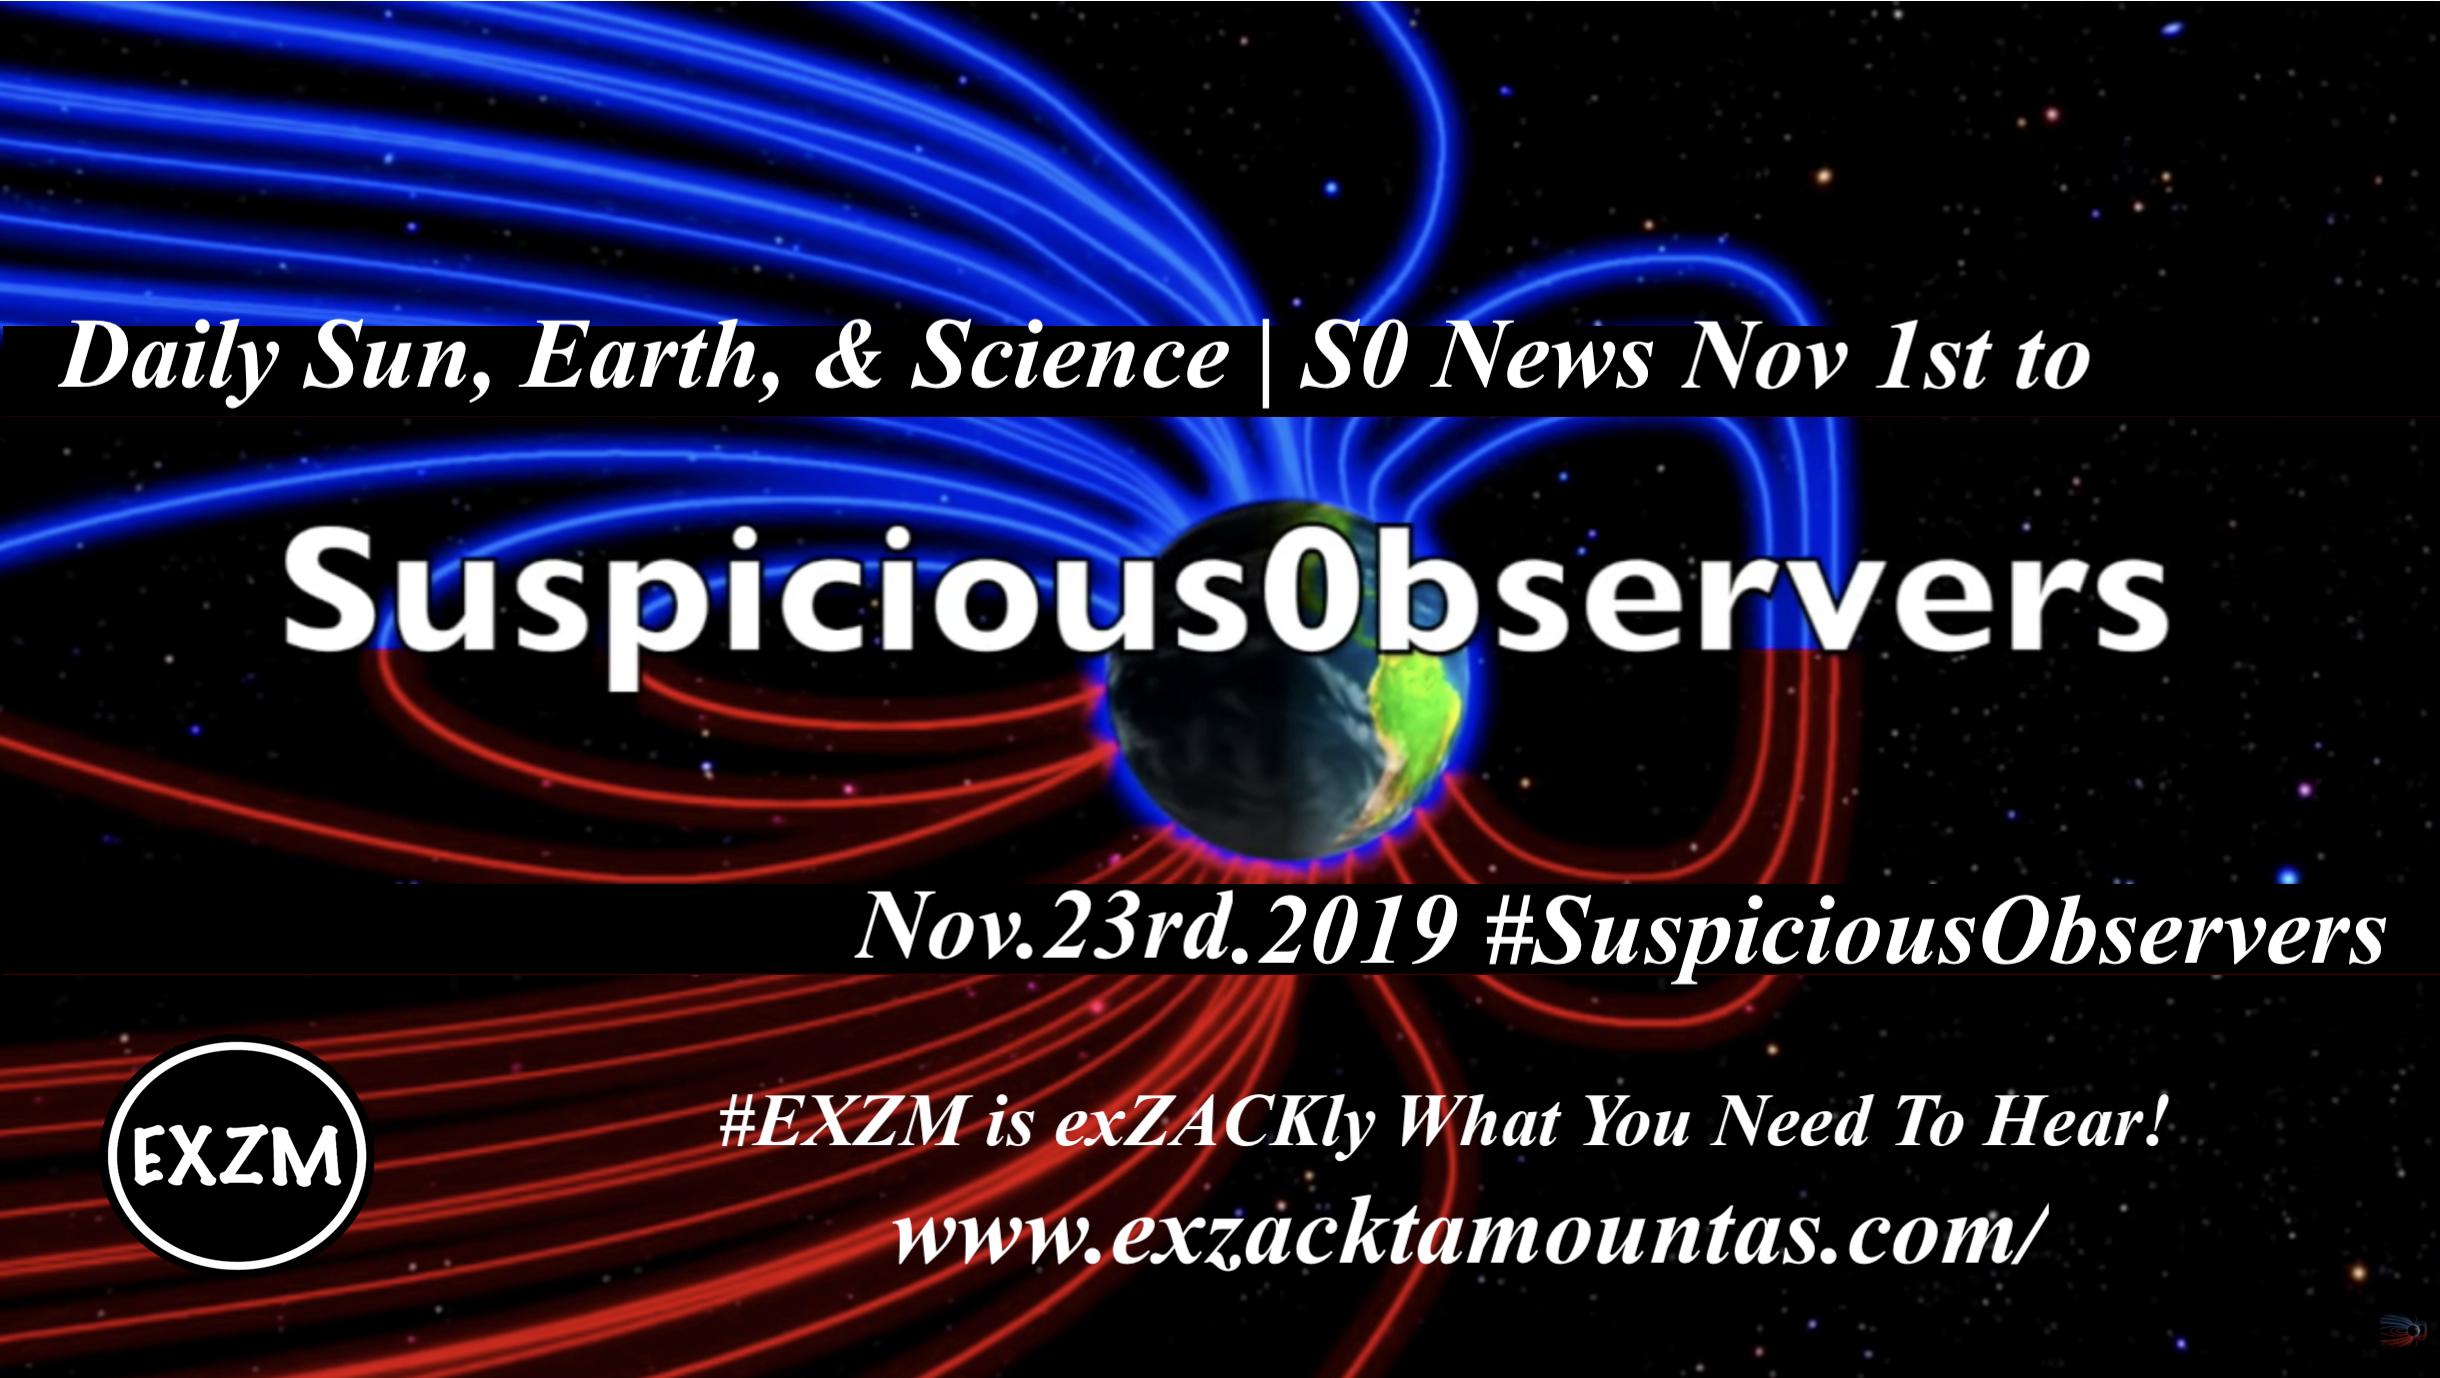 EXZM Suspicious Observers 11 23 2019